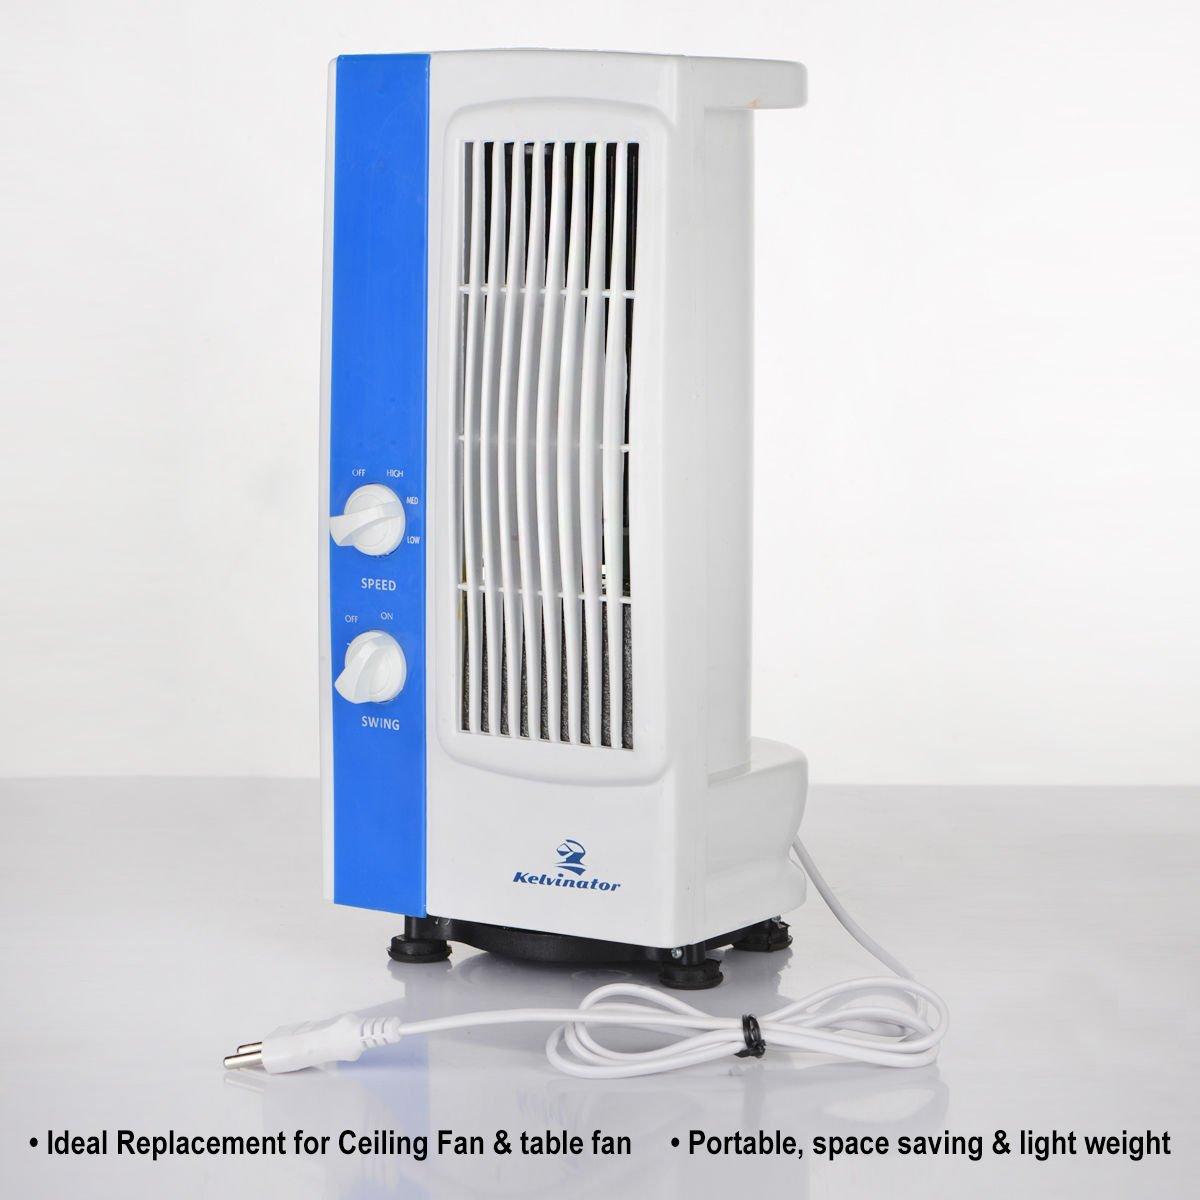 Kelvinator KTF-051 Mini Revolving Tower fan